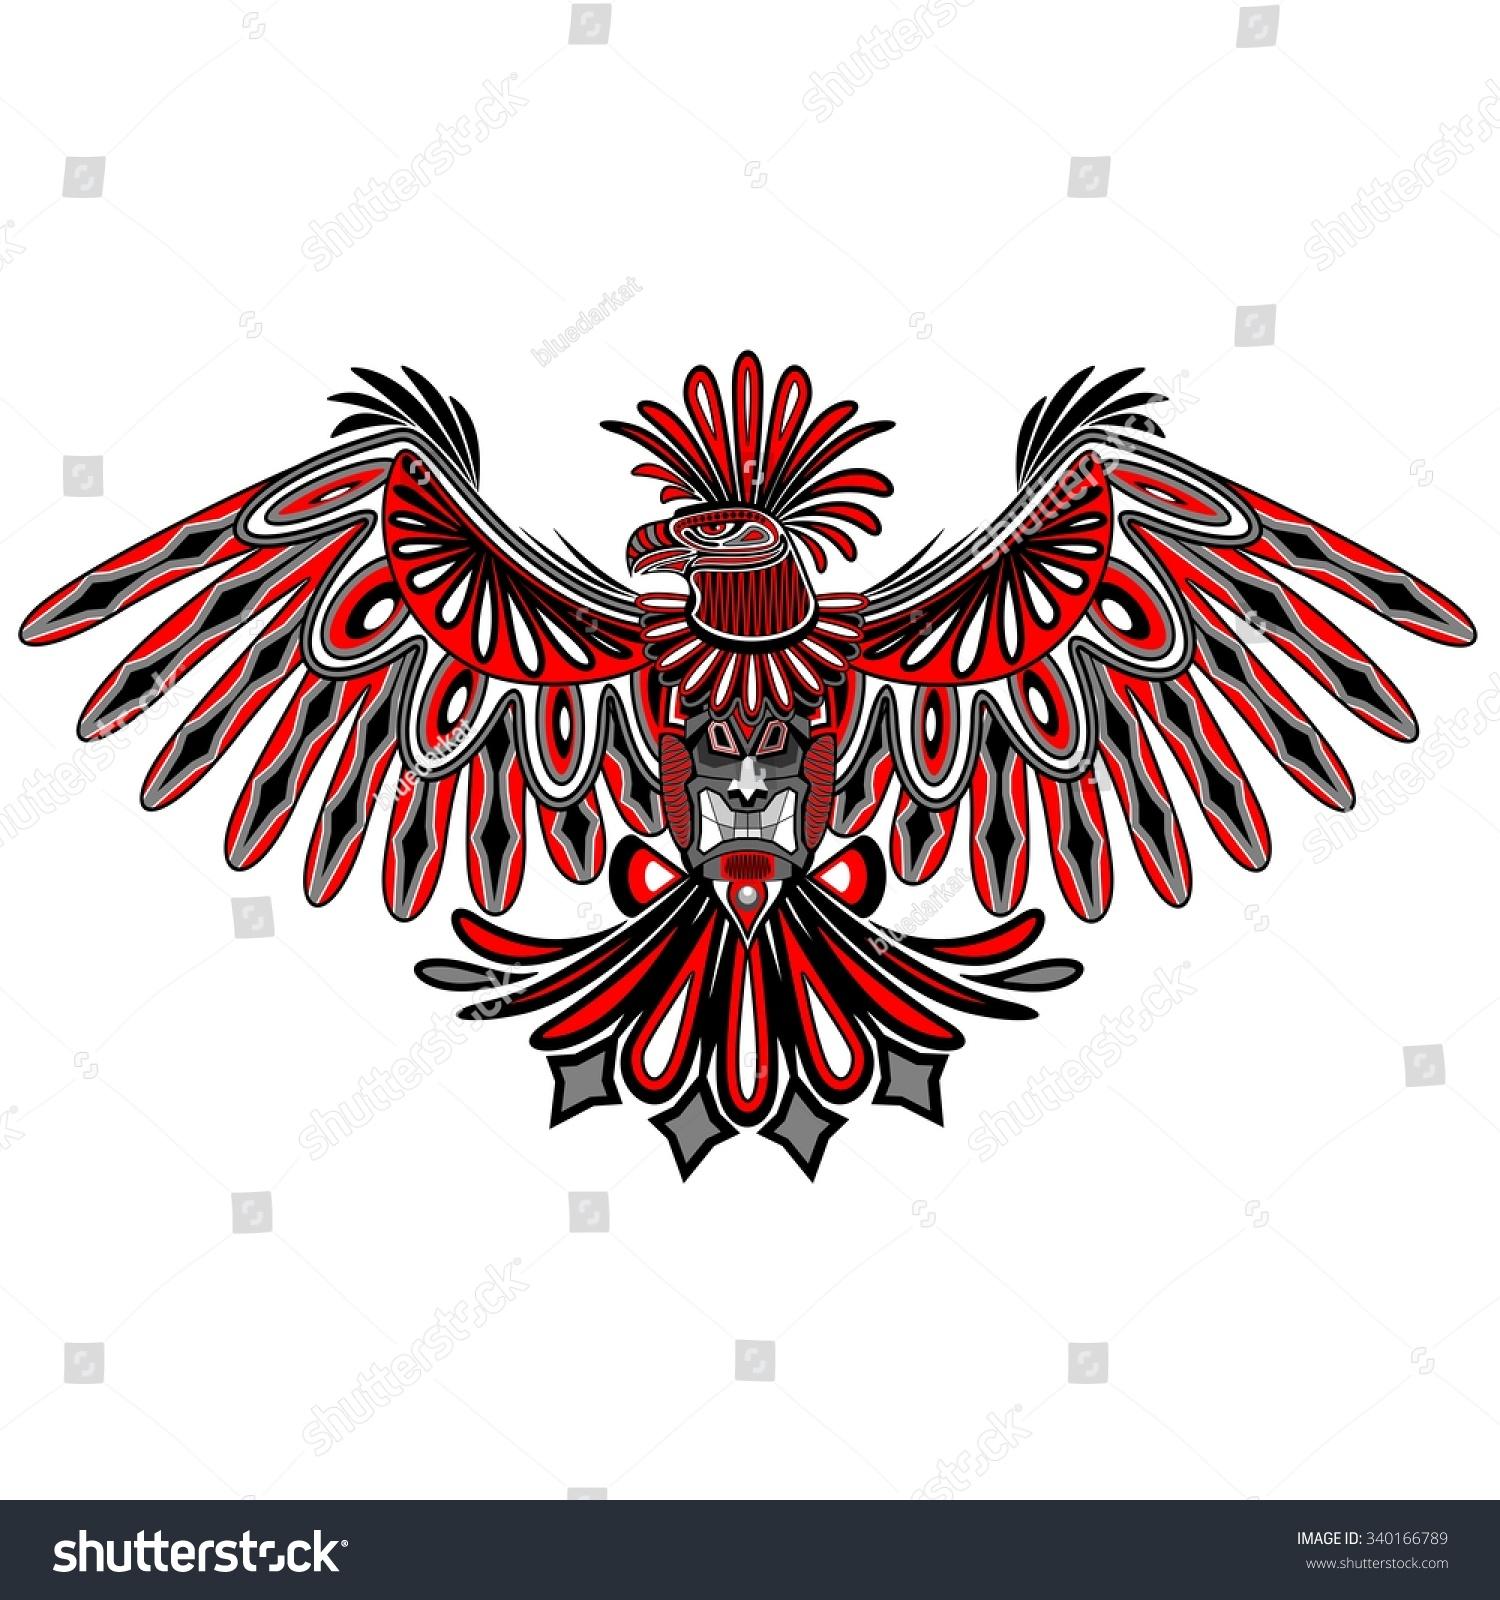 eagle tattoo style haida art stock vector illustration 340166789 shutterstock. Black Bedroom Furniture Sets. Home Design Ideas